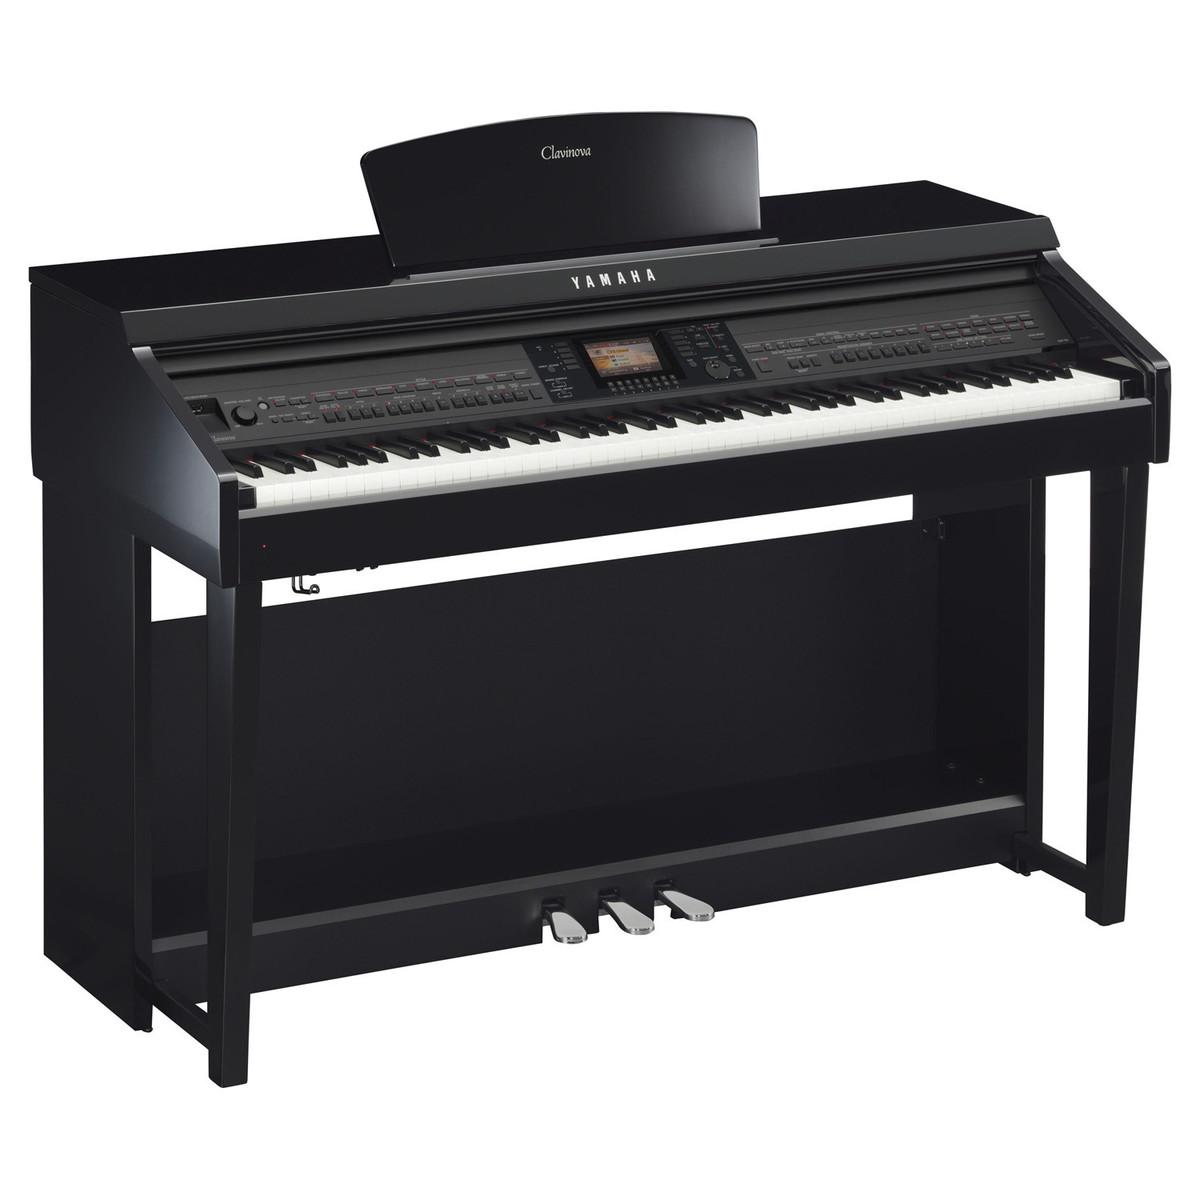 Yamaha cvp701 clavinova digital piano polished ebony at for Yamaha digital piano clavinova